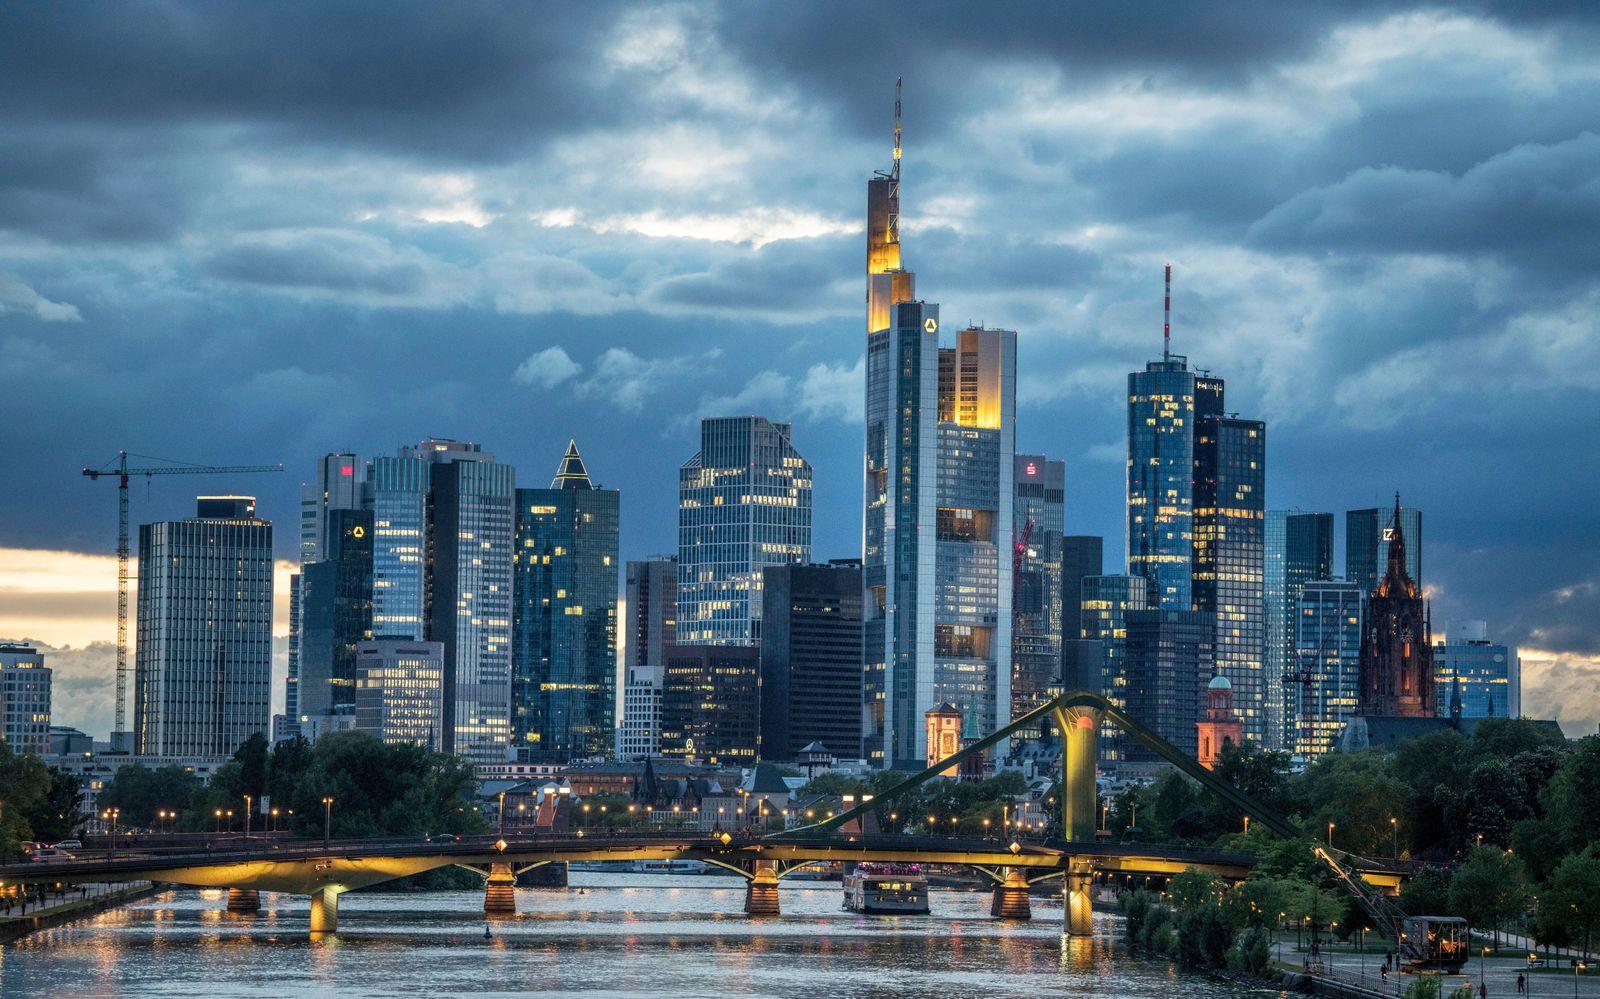 Frankfurt Skyline / Banken